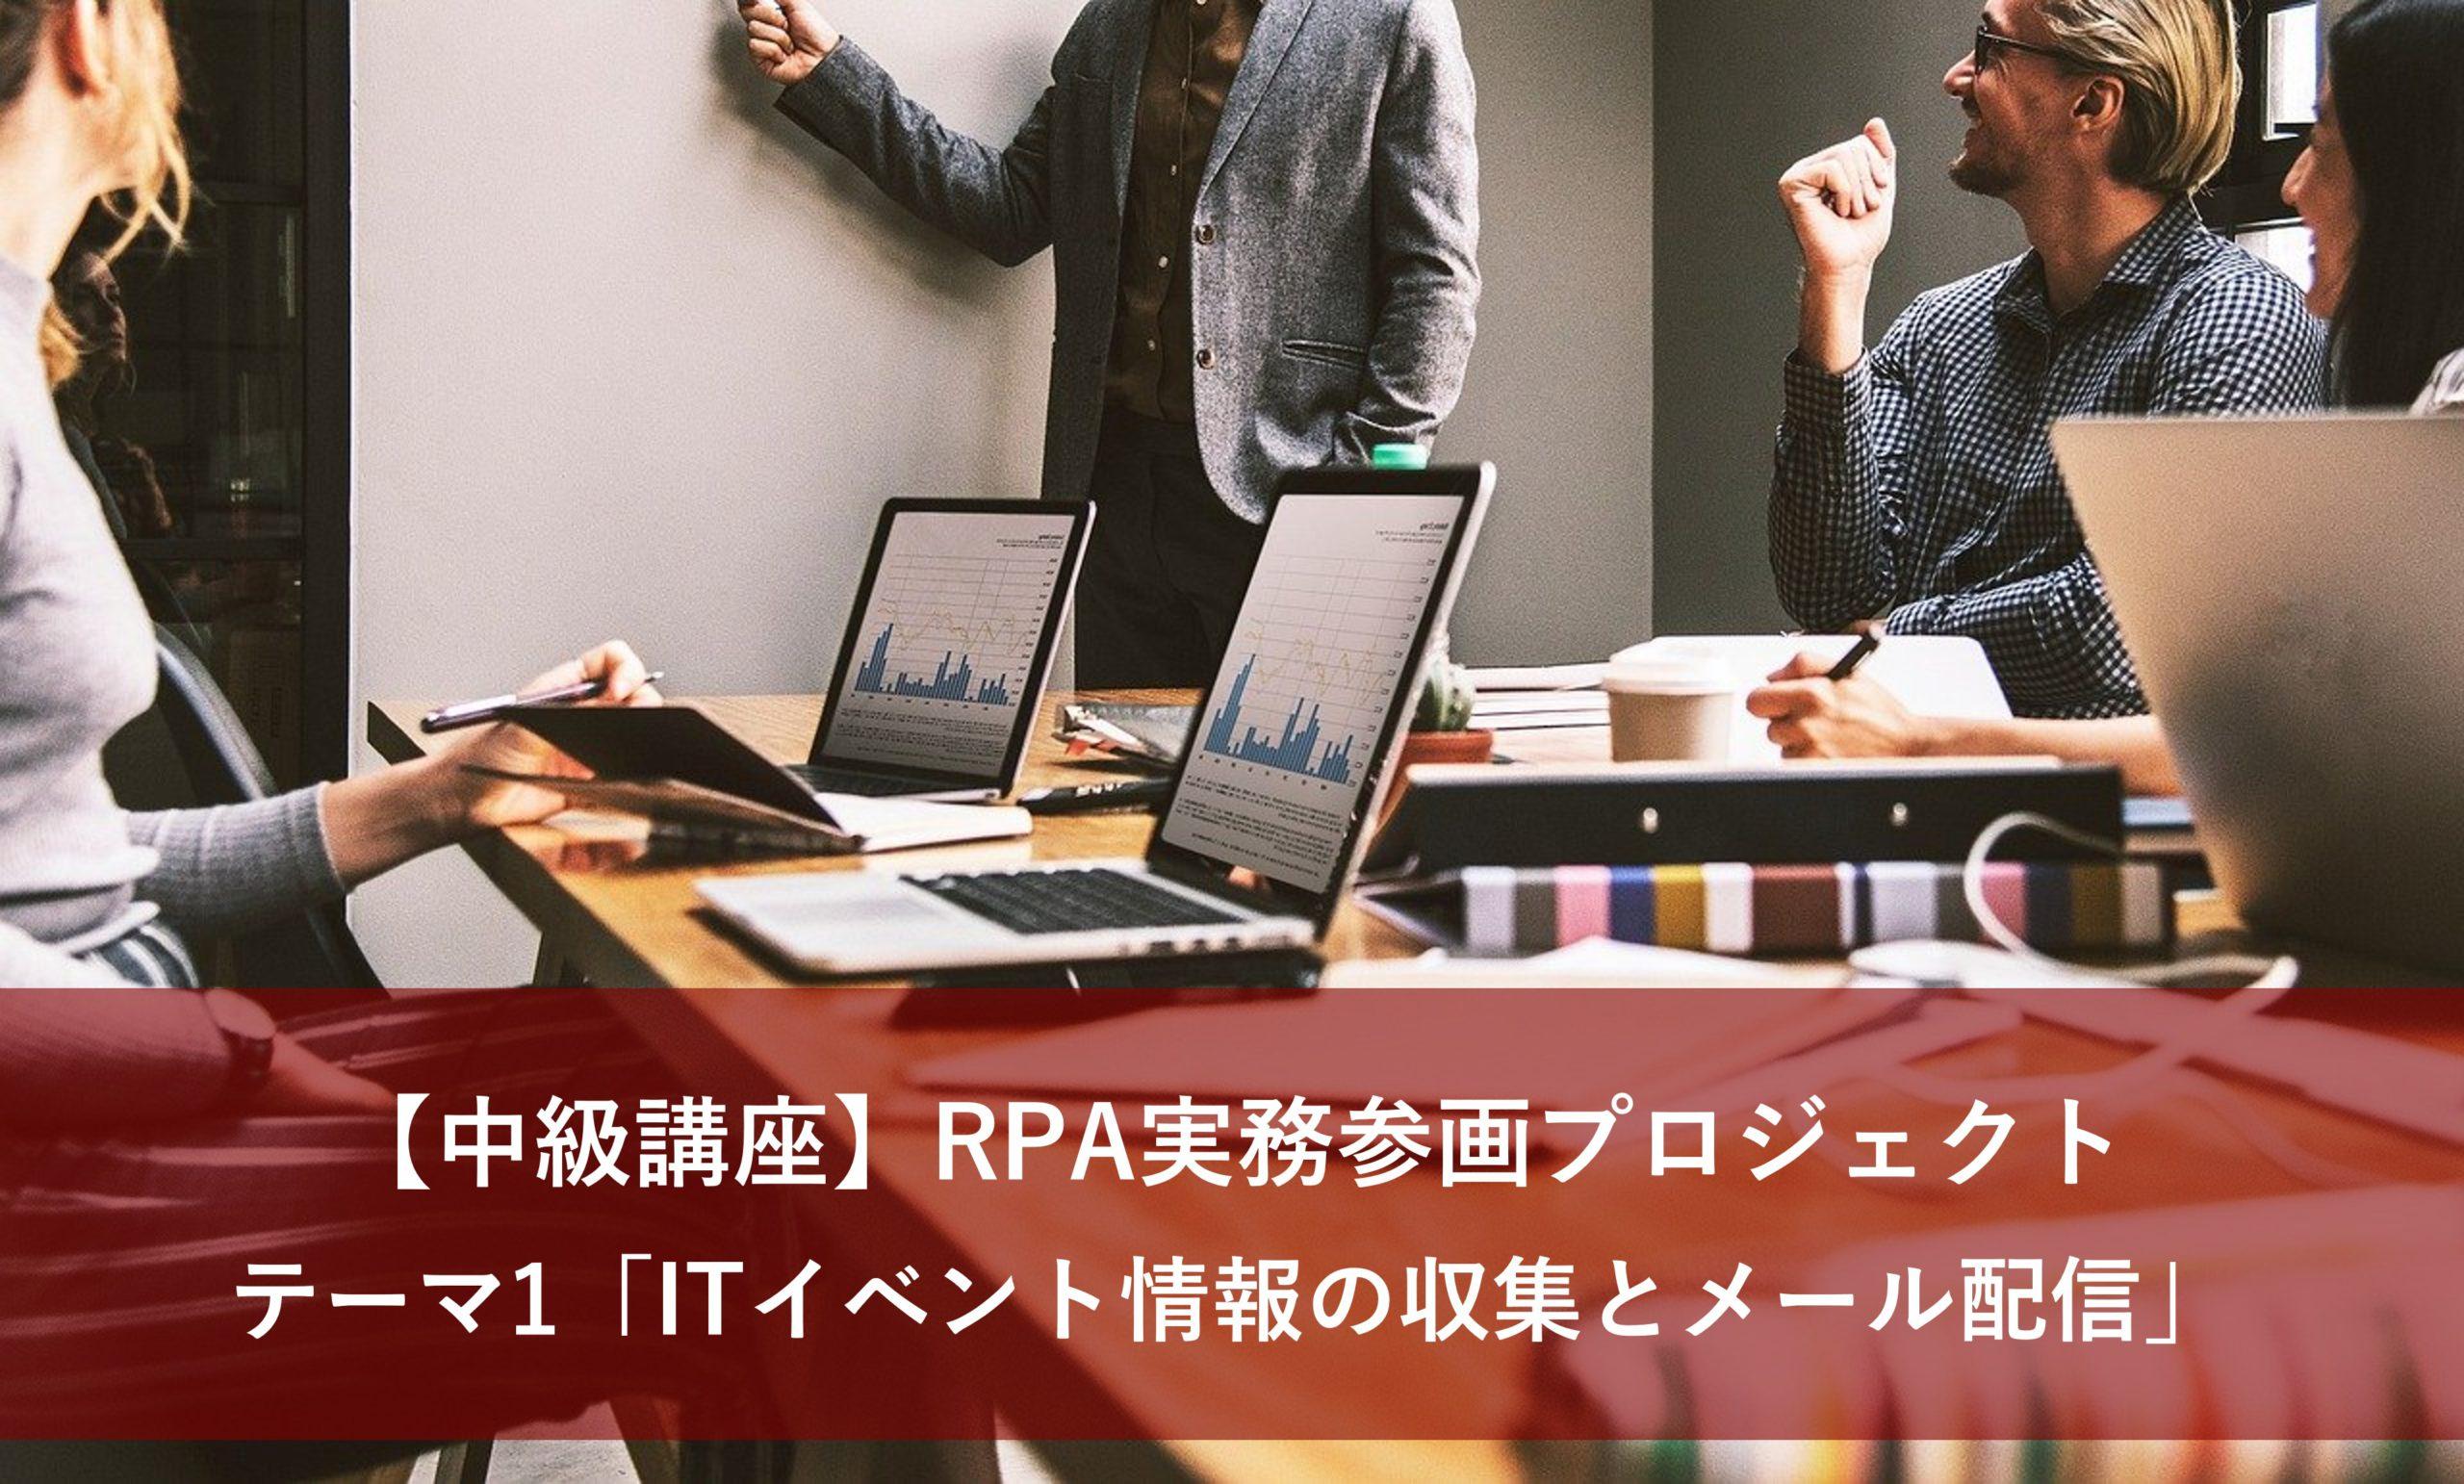 rpa intermediate theme1